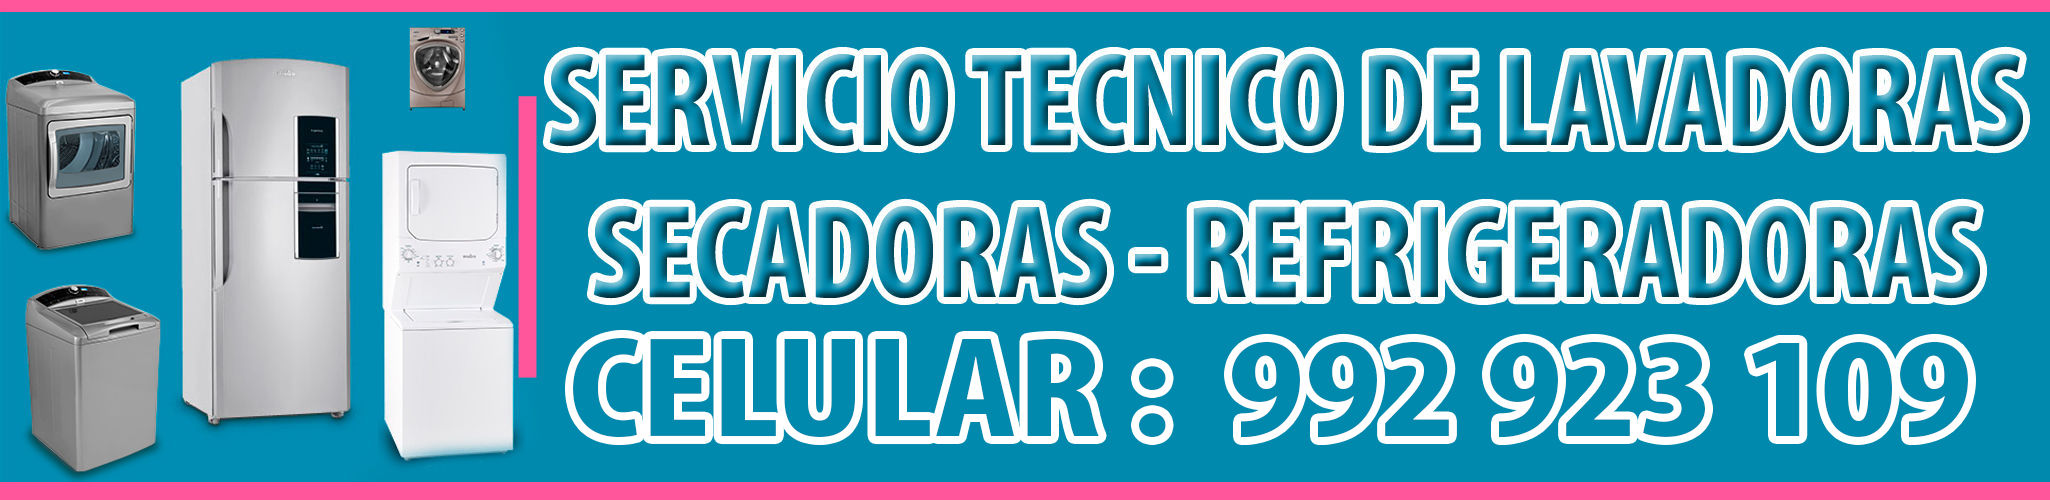 SERVICIO TECNICO MABE - SERVICIO TECNICO GENERAL ELECTRIC